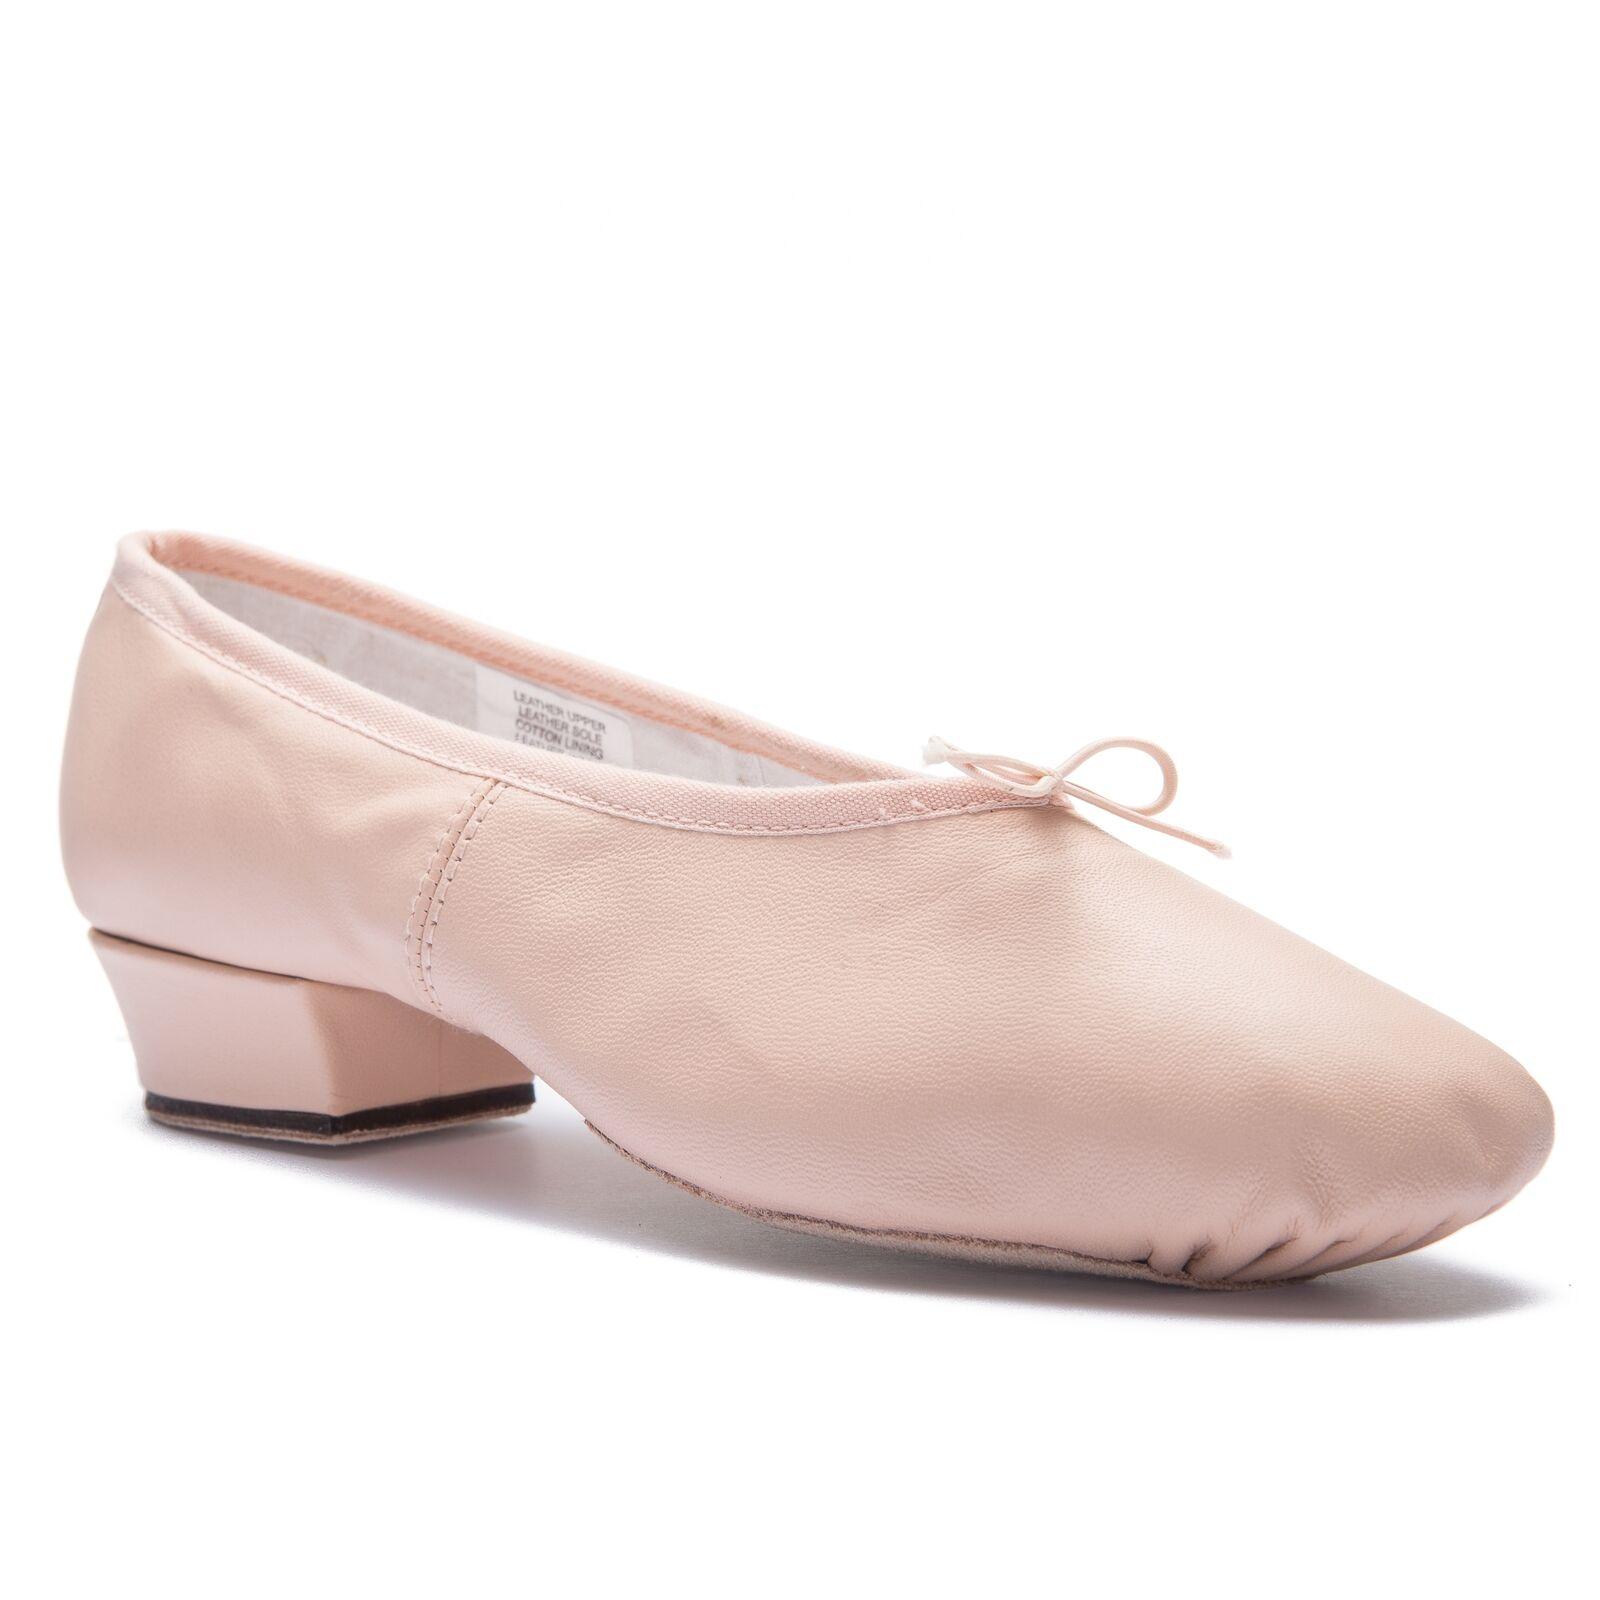 Bloch 0427L Paris Damen Unterricht Trainer Ballett Tanz Leder Leder Leder Schuhe Rosa 56b2fc